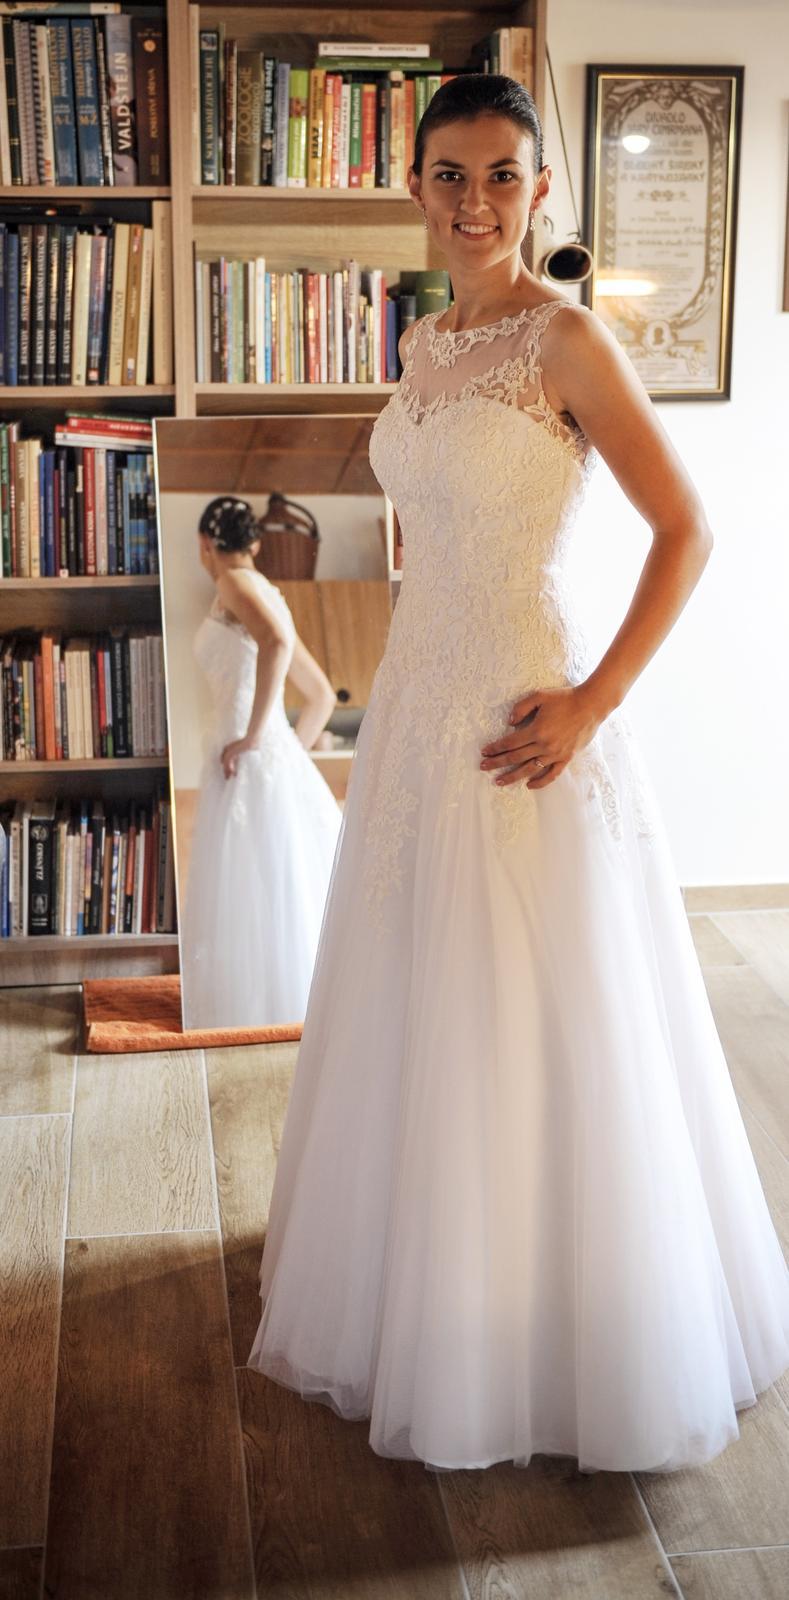 0082fca73075 Svatební šaty krajka + tyl